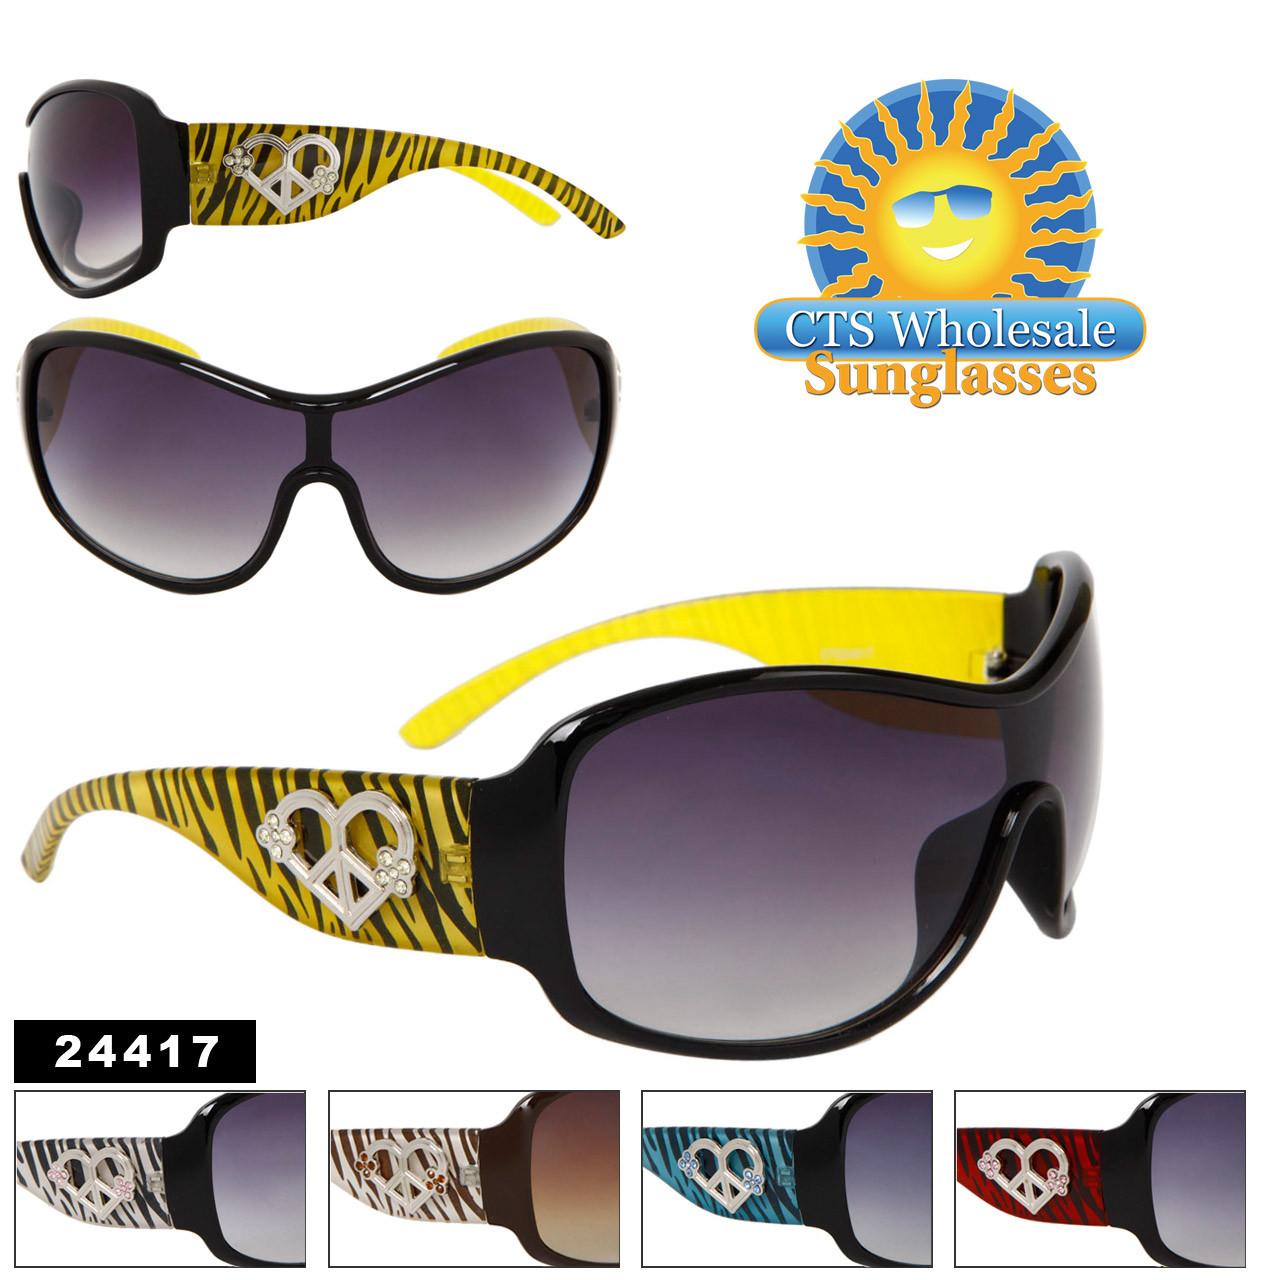 #24417 Designer Sunglasses with Rhinestone Hearts